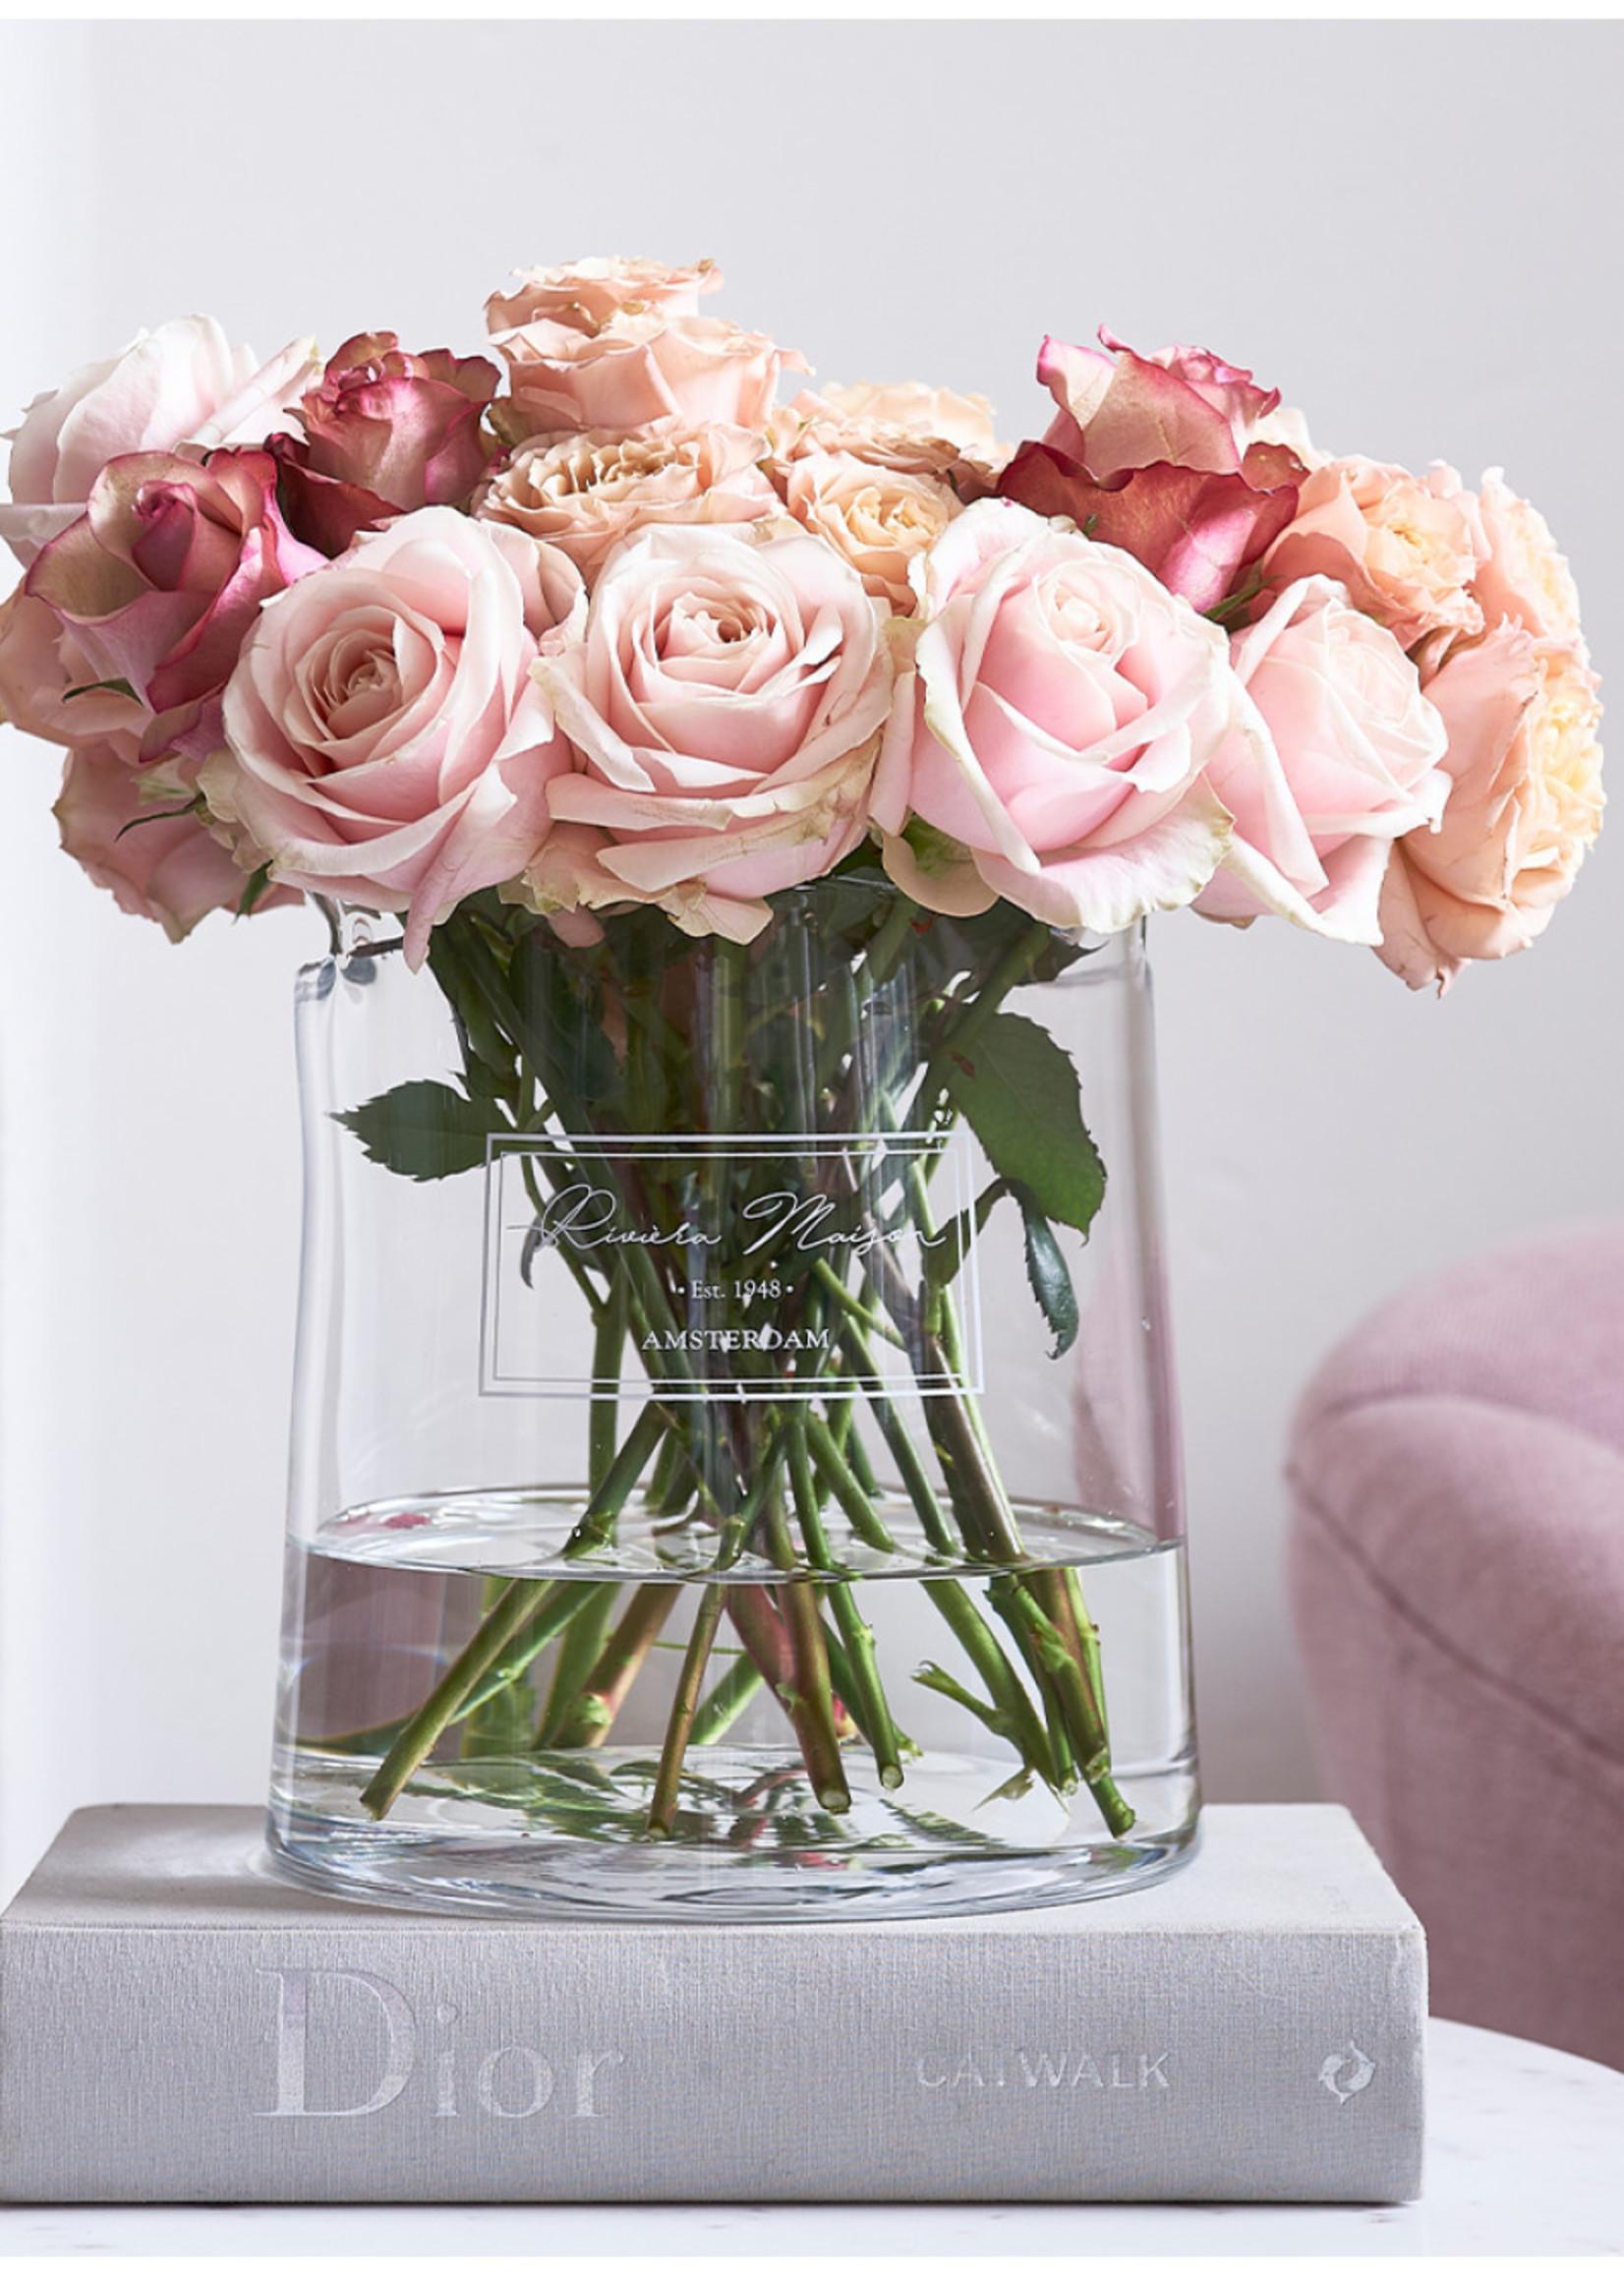 Riviera Maison RM 1948 Flower Vase